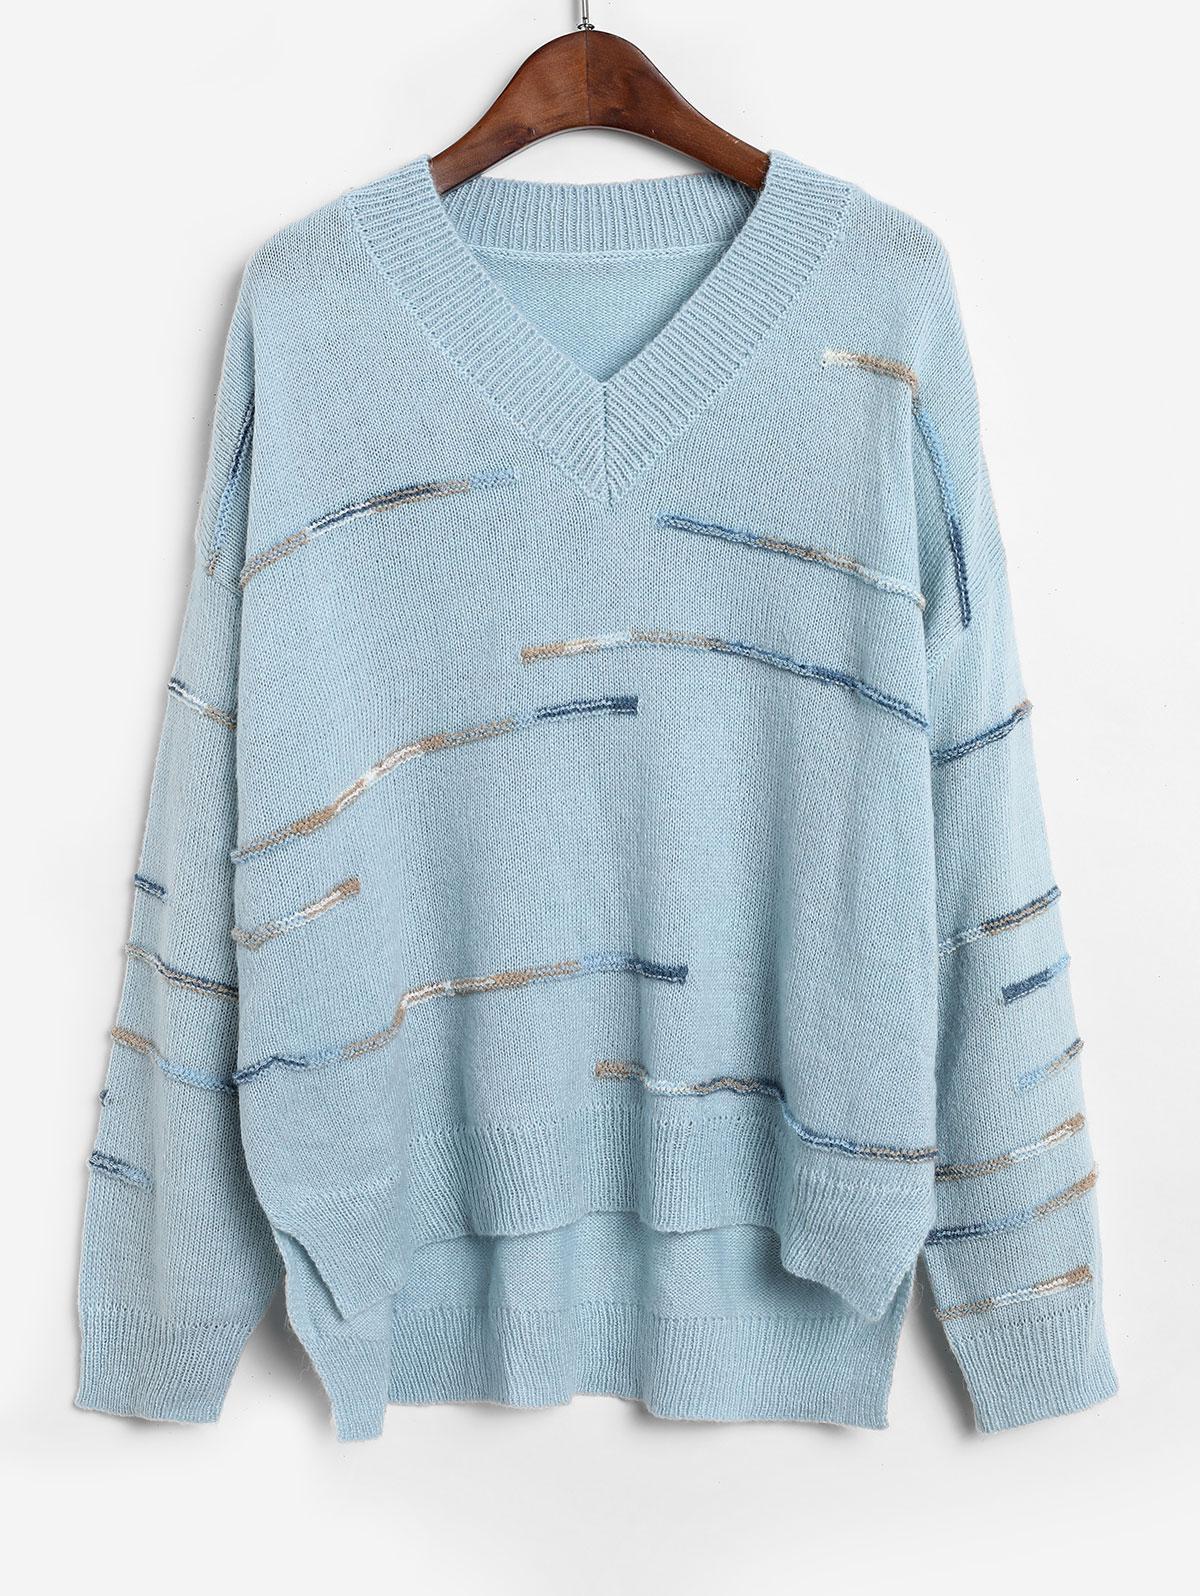 ZAFUL Embellished Side Slit High Low Sweater